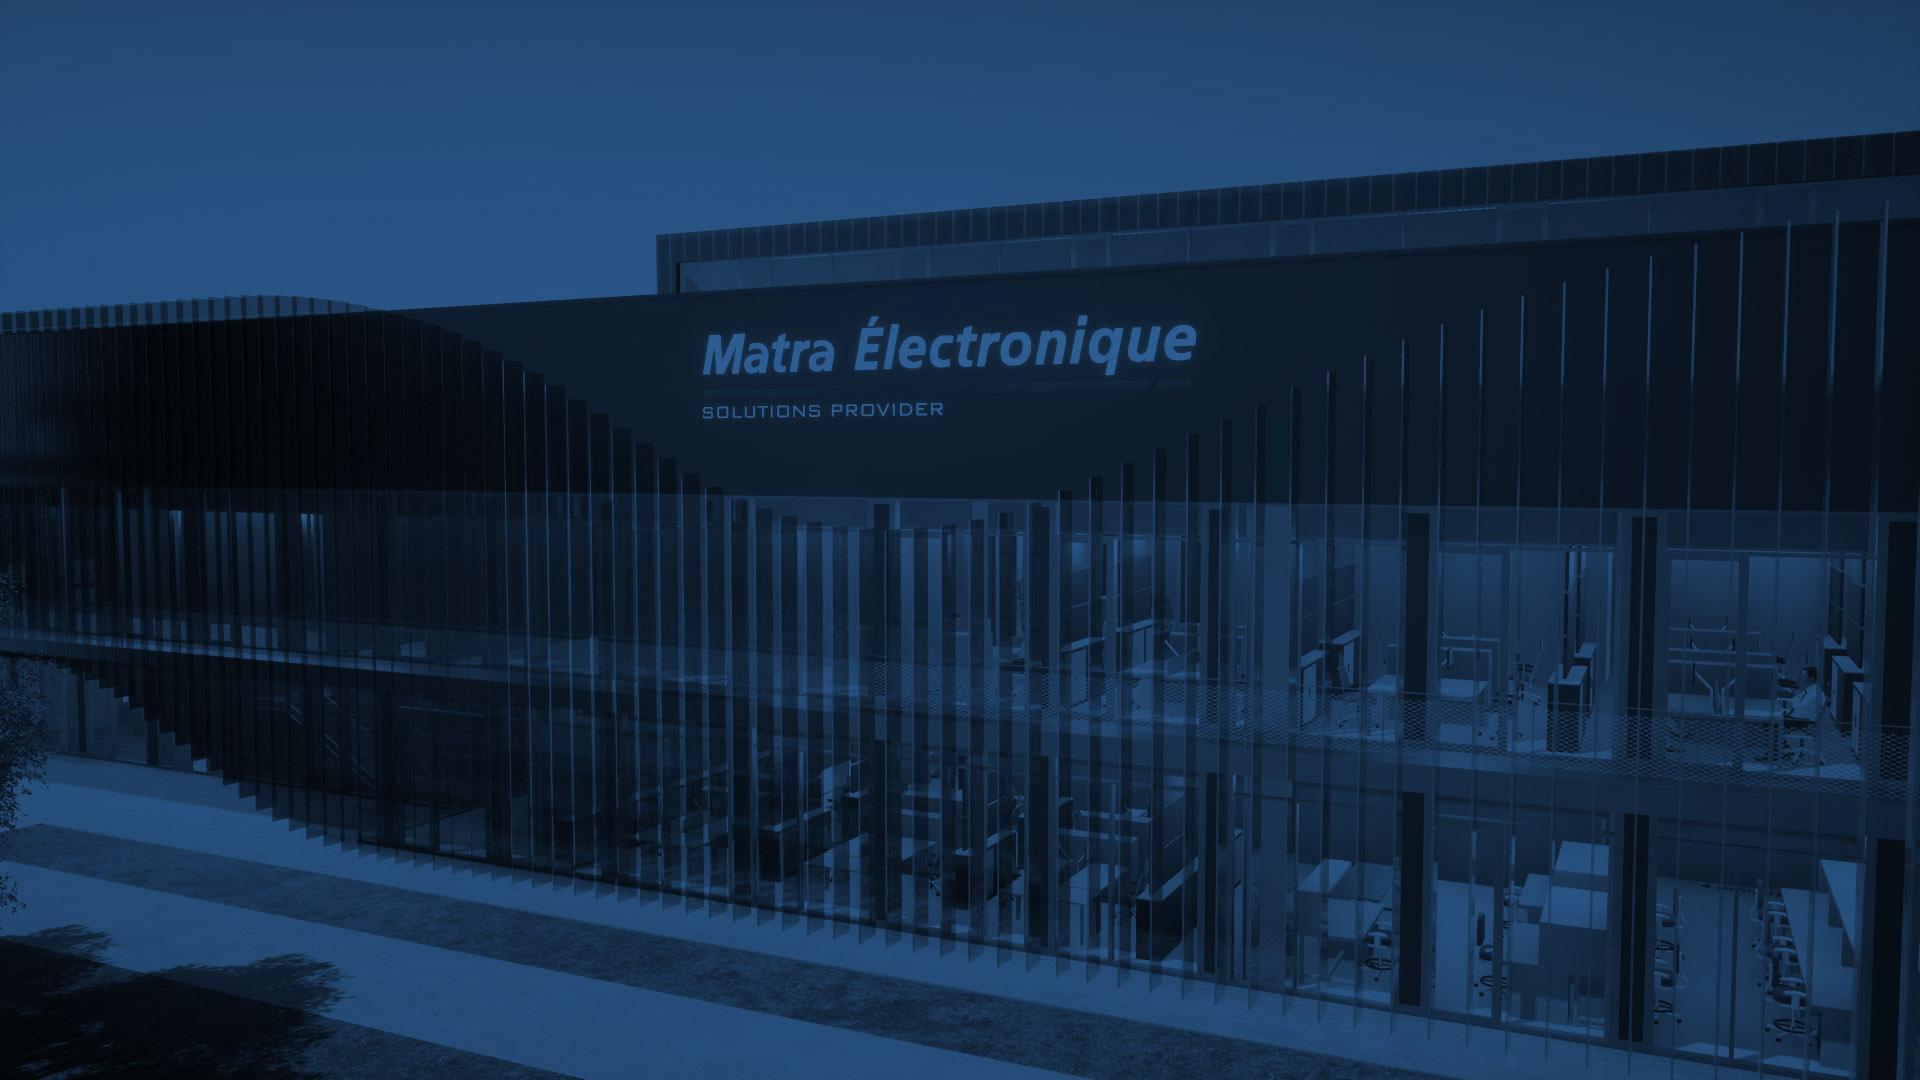 https://horizon.matra-electronique.com/wp-content/uploads/2021/02/IMG-FOND-projet-horizon-usine-future-4-0-matra-electronique.jpg